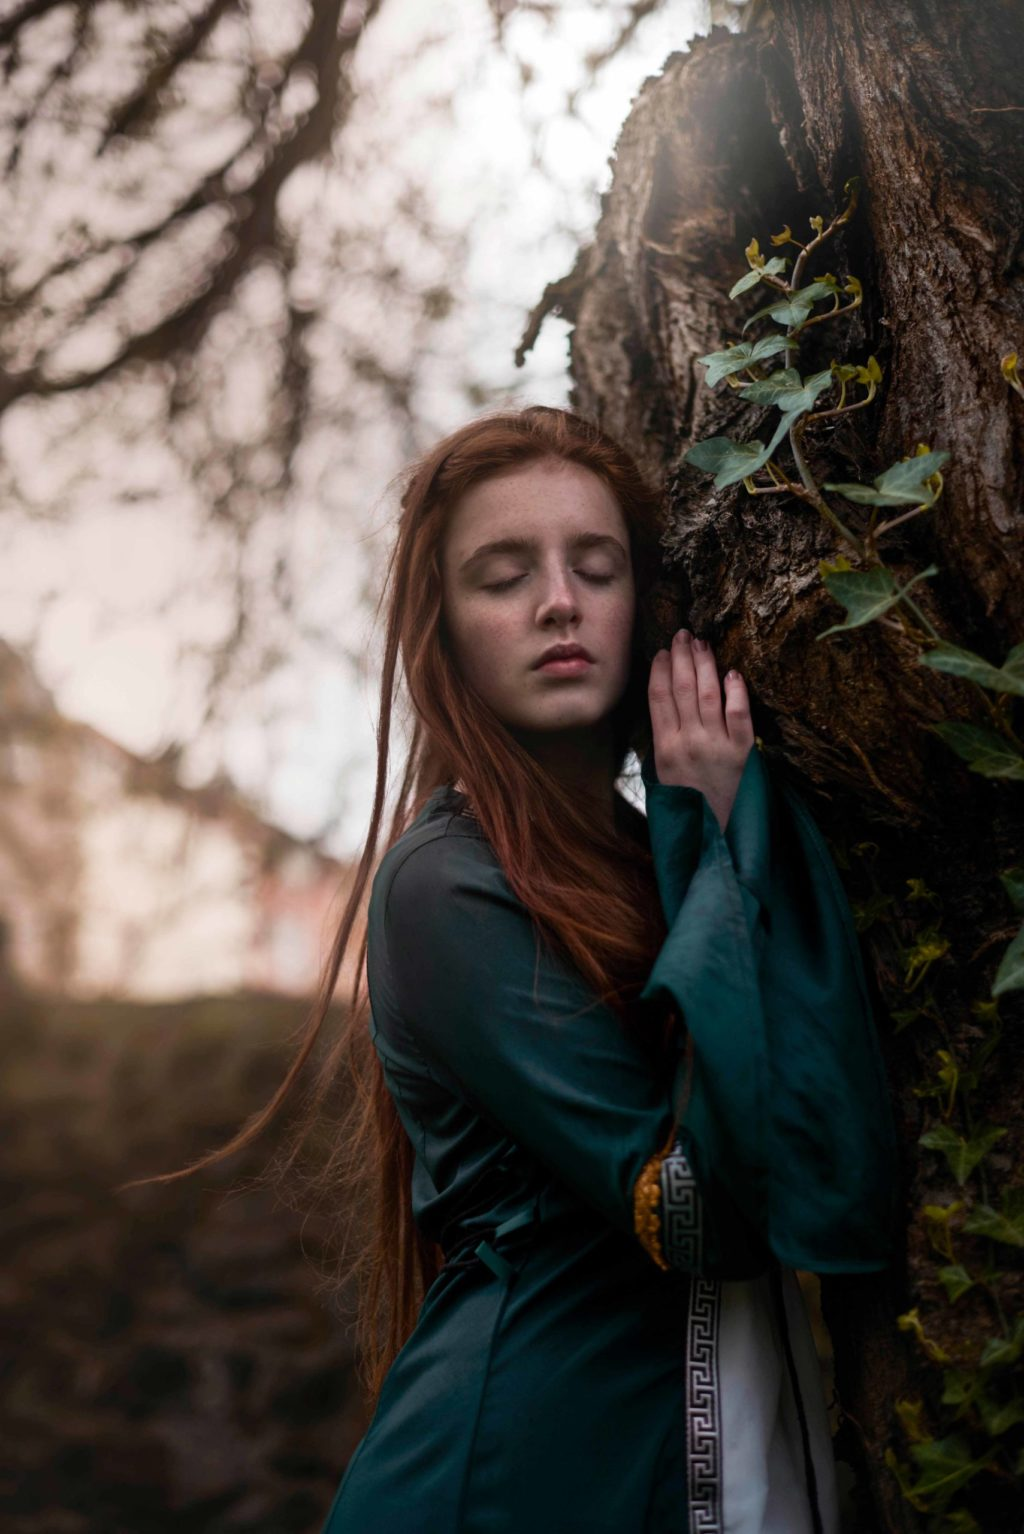 redhair, sleepingbeauty, princess, film, story, photo